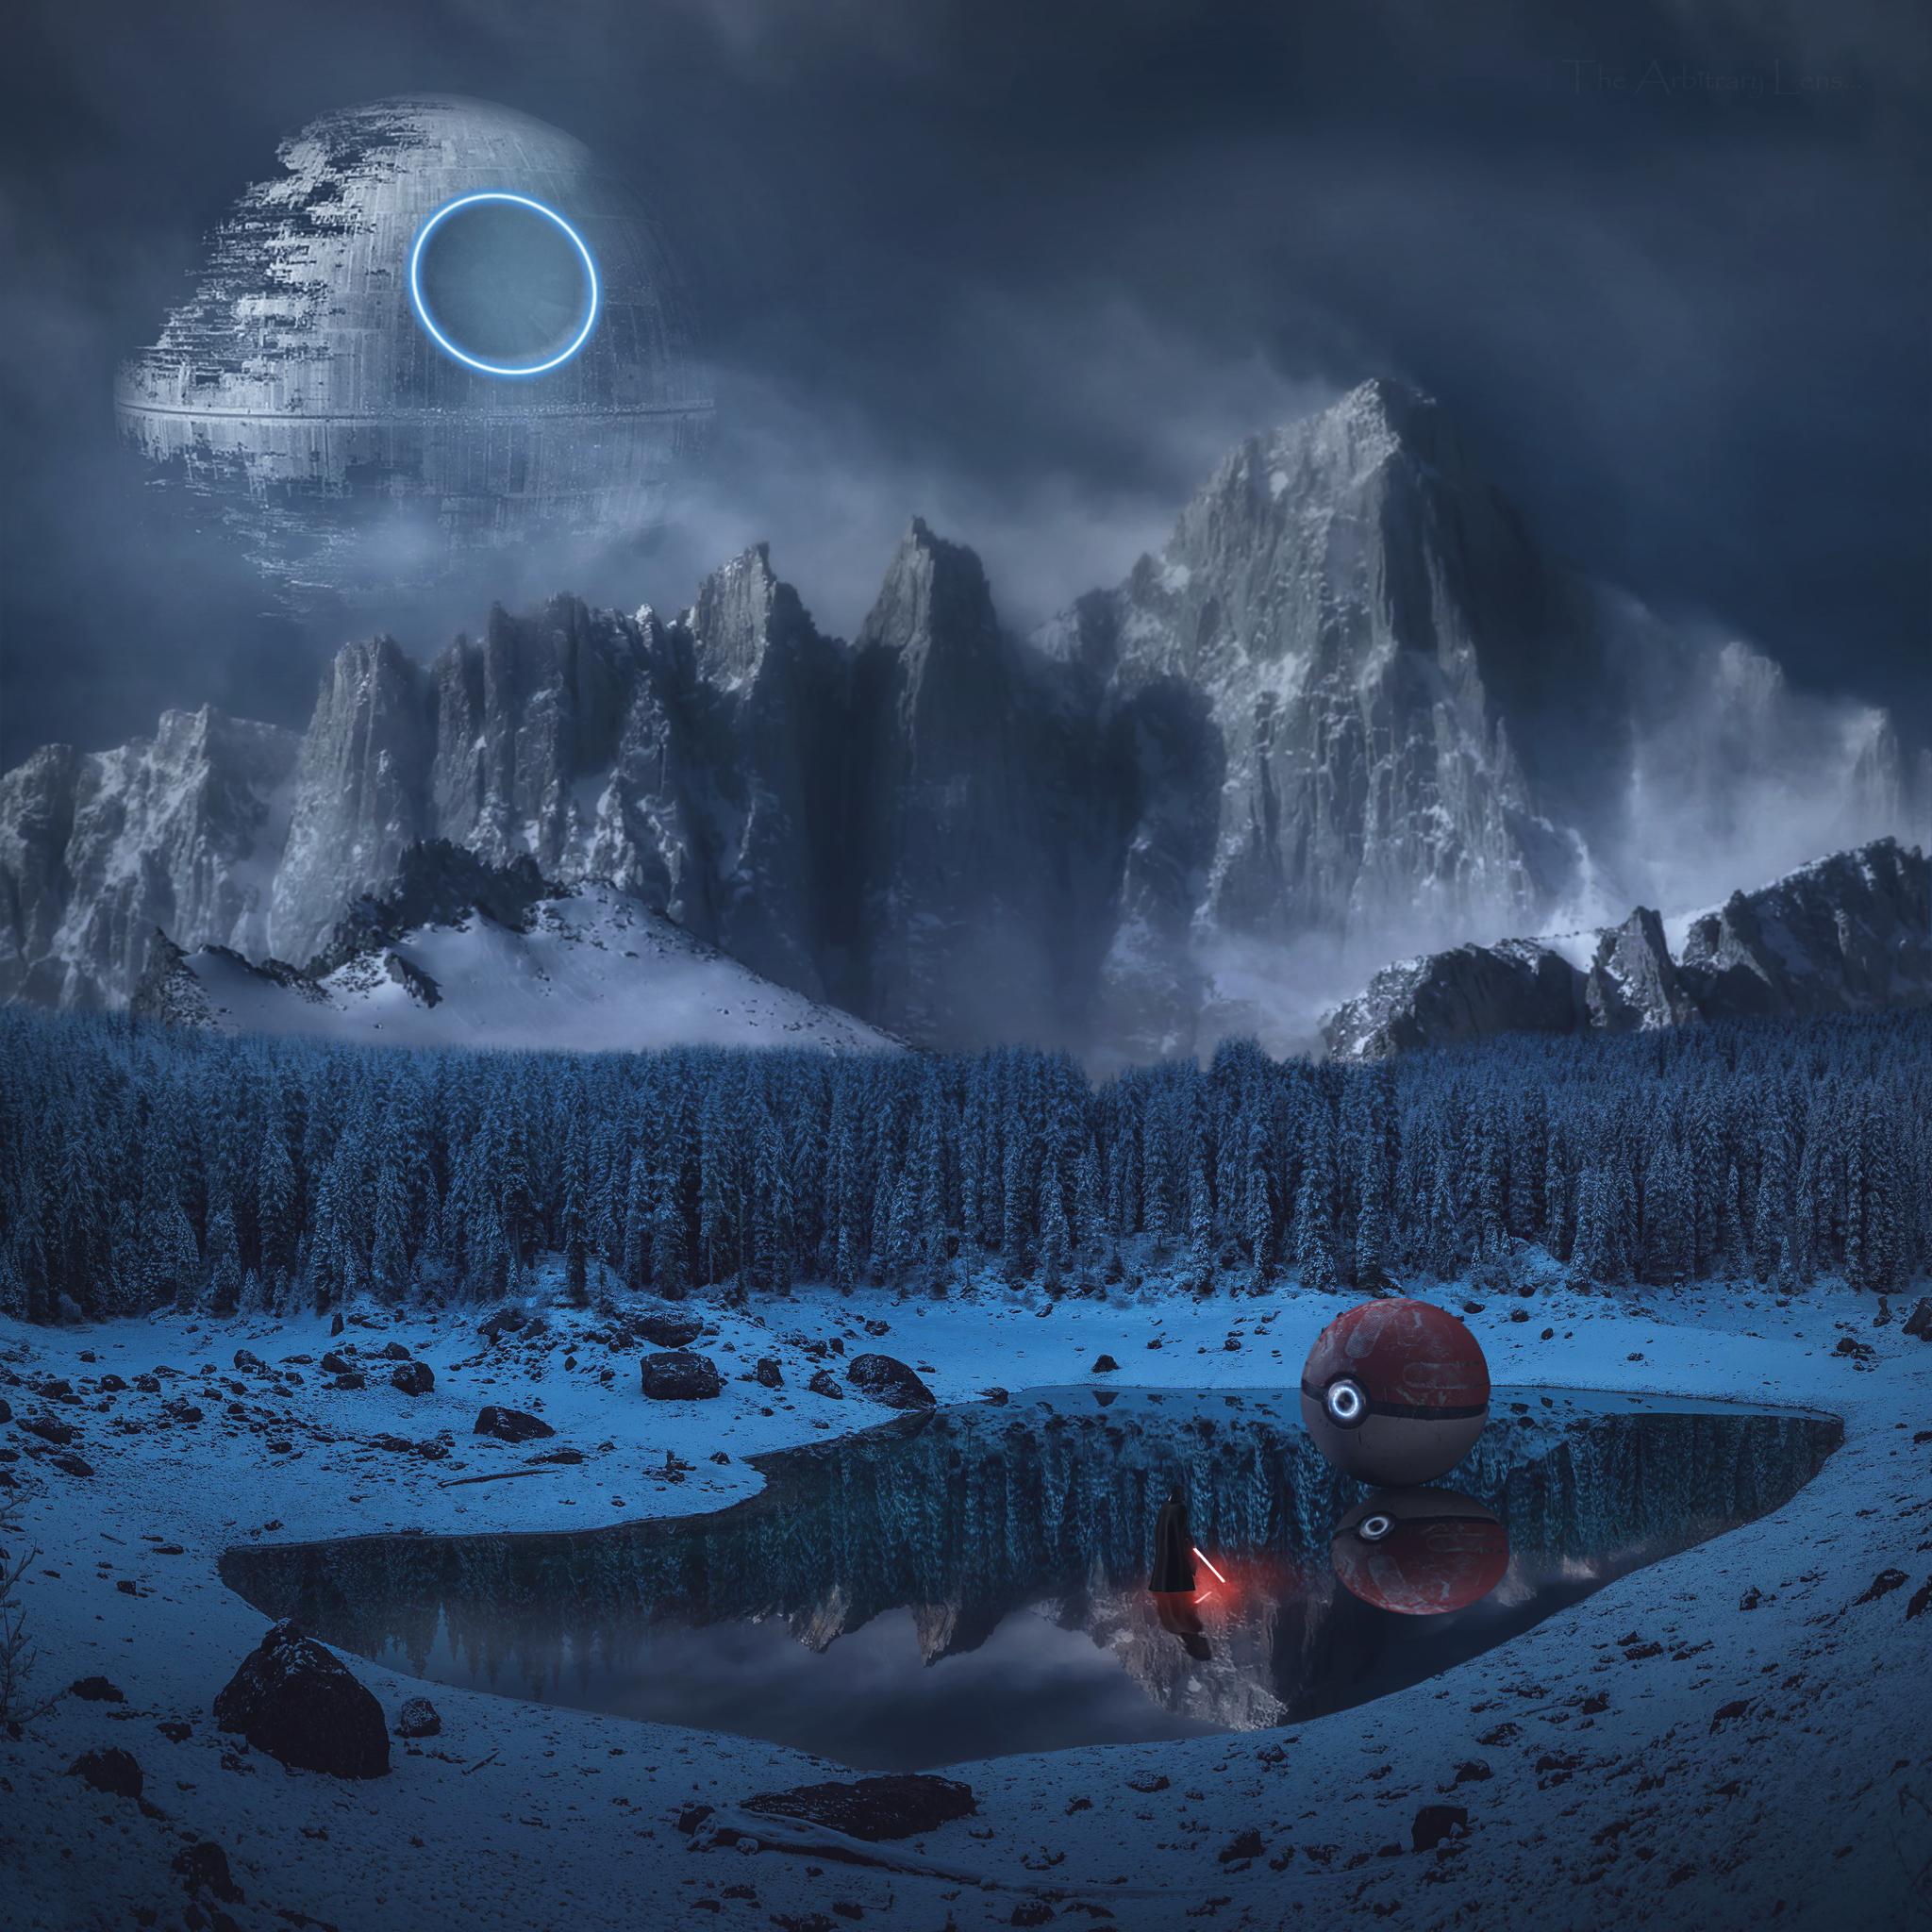 Wallpaper Pokemon Star Wars Vader Mountains Lake Pok Balls Lightsaber Winter 2048x2048 Afterworld 1596143 Hd Wallpapers Wallhere